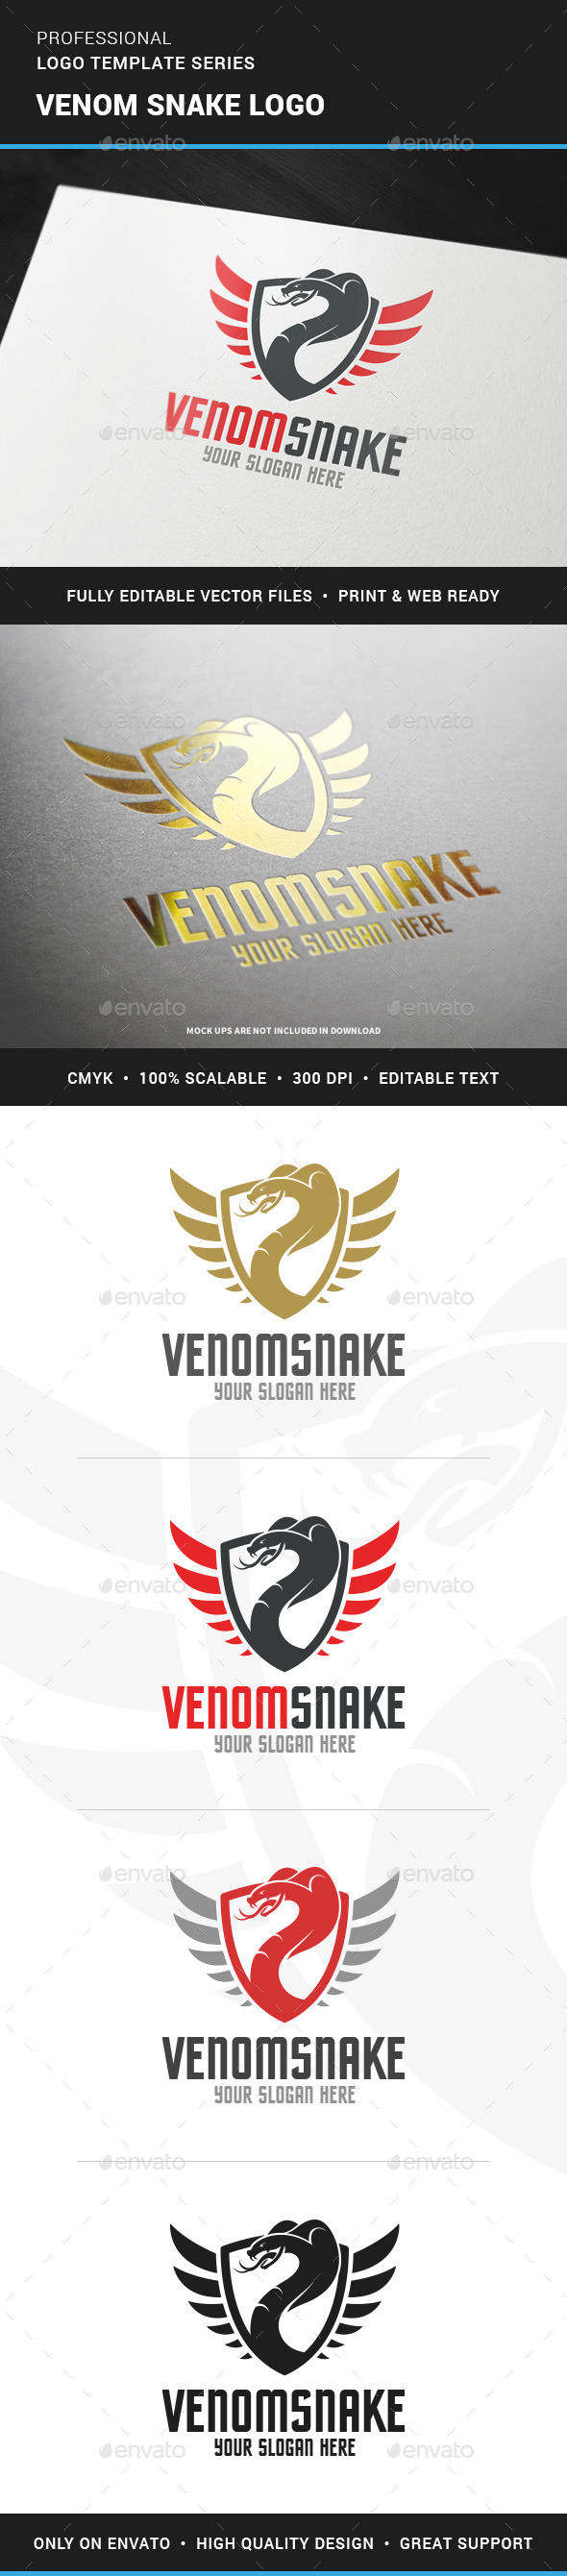 Venom Snake Logo Template - Animals Logo Templates